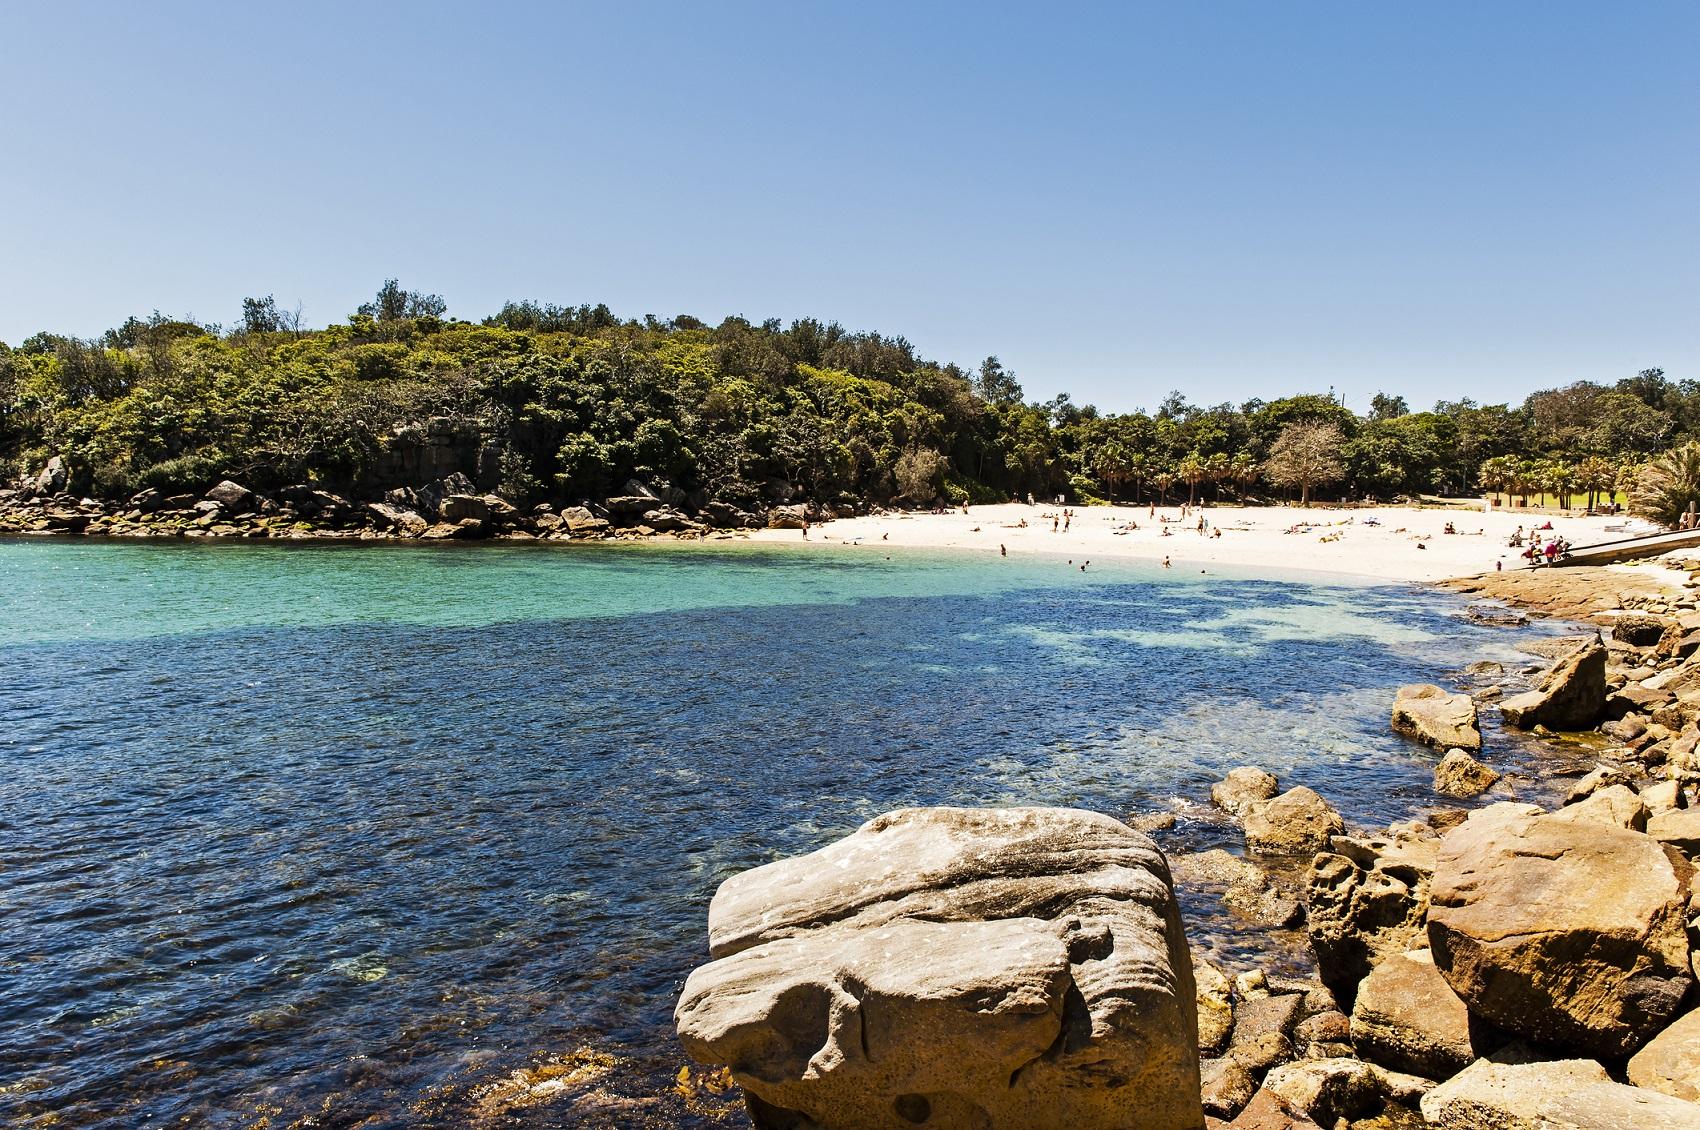 shelly-beach-manly-australia-scenic-tourism